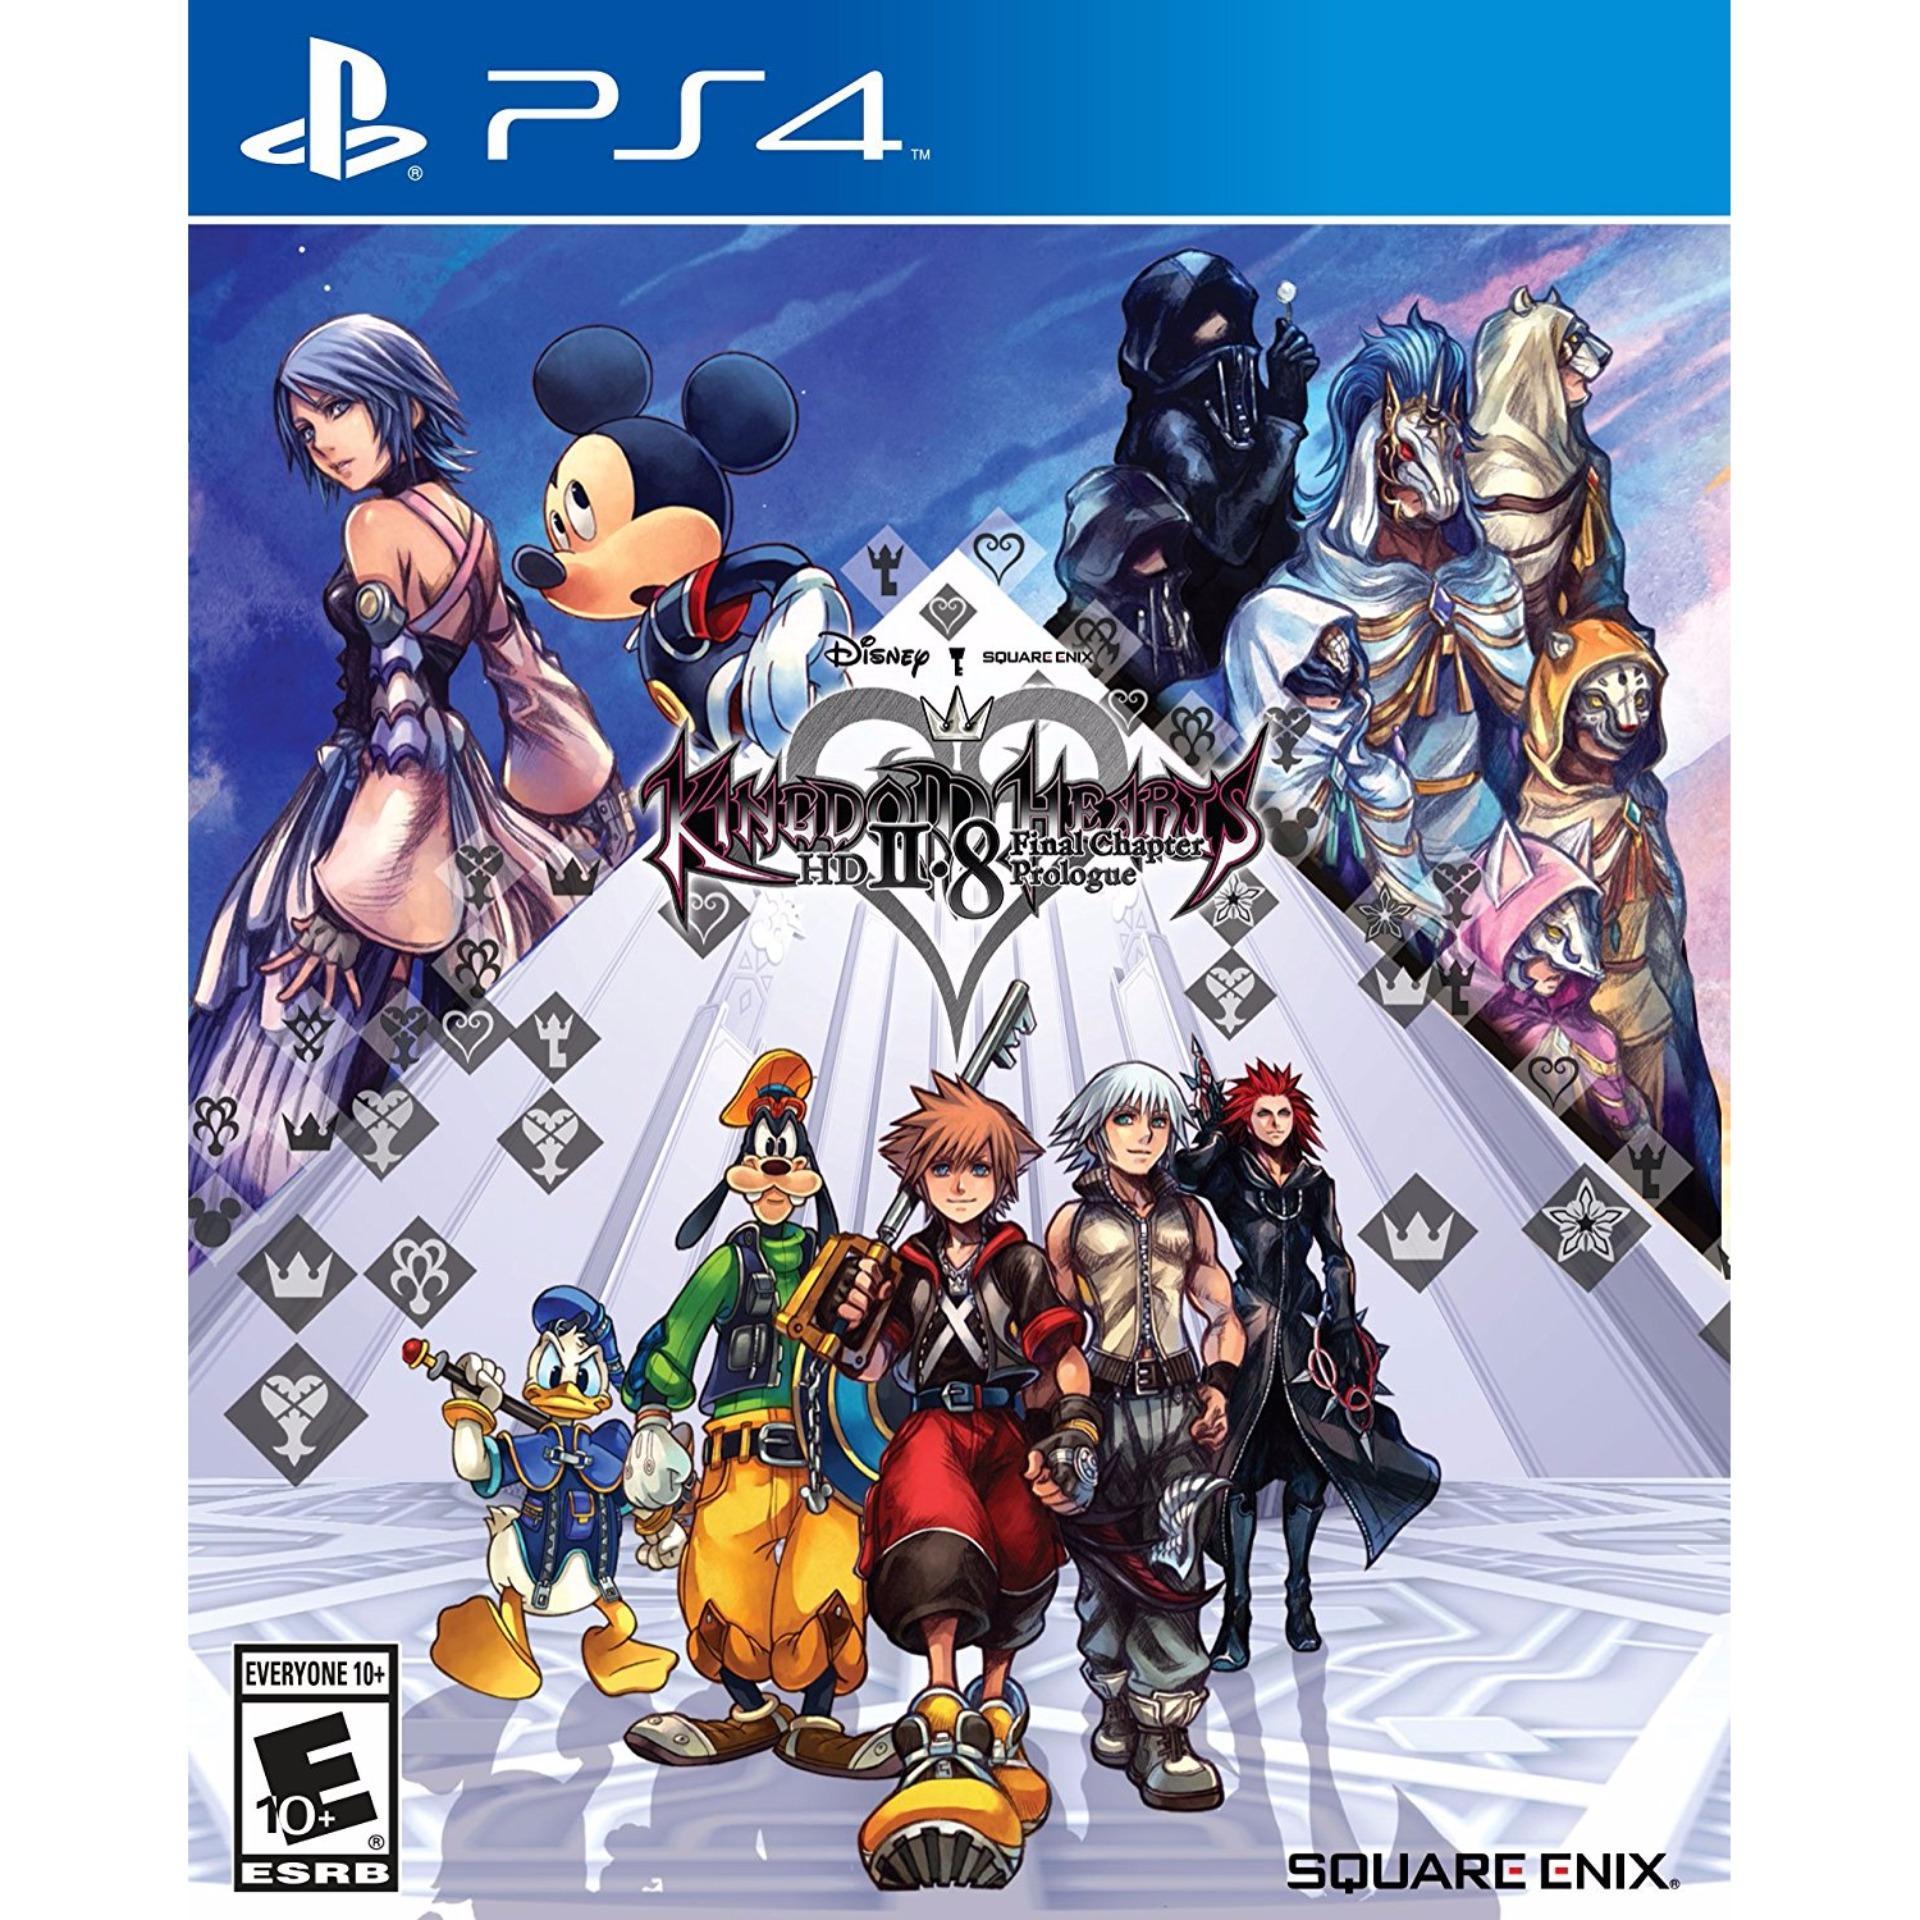 Đĩa Game Ps4 Kingdom Hearts Hd 2.8 Final Chapter Prologue